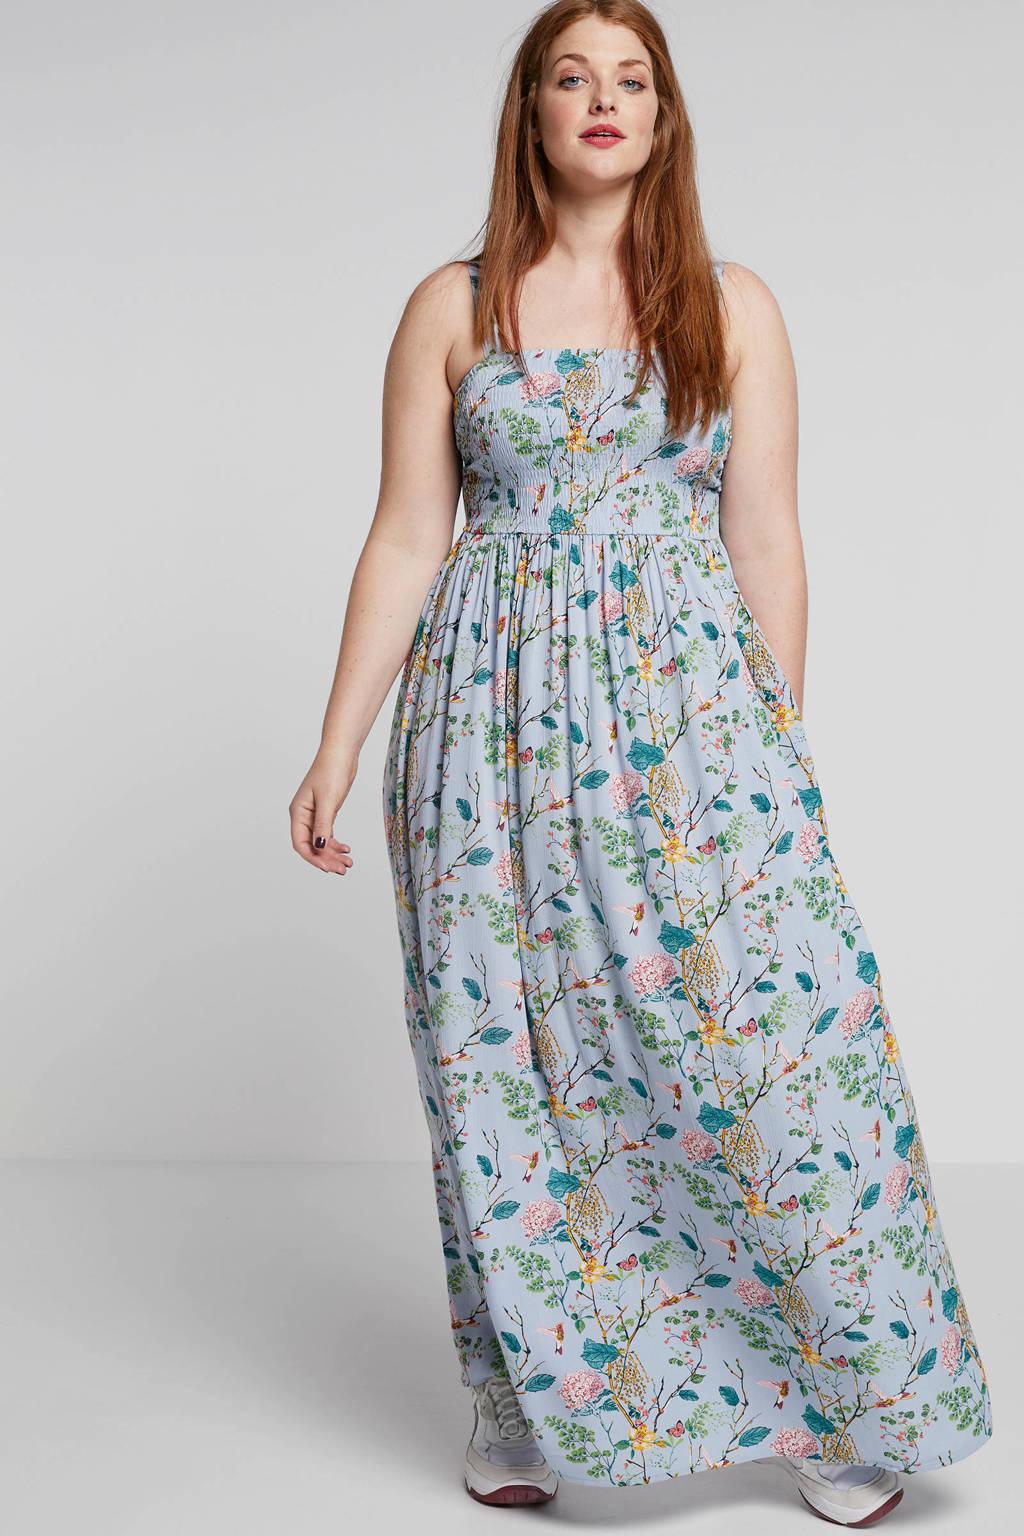 Zizzi jurk met bloemenprint, Blauw multi